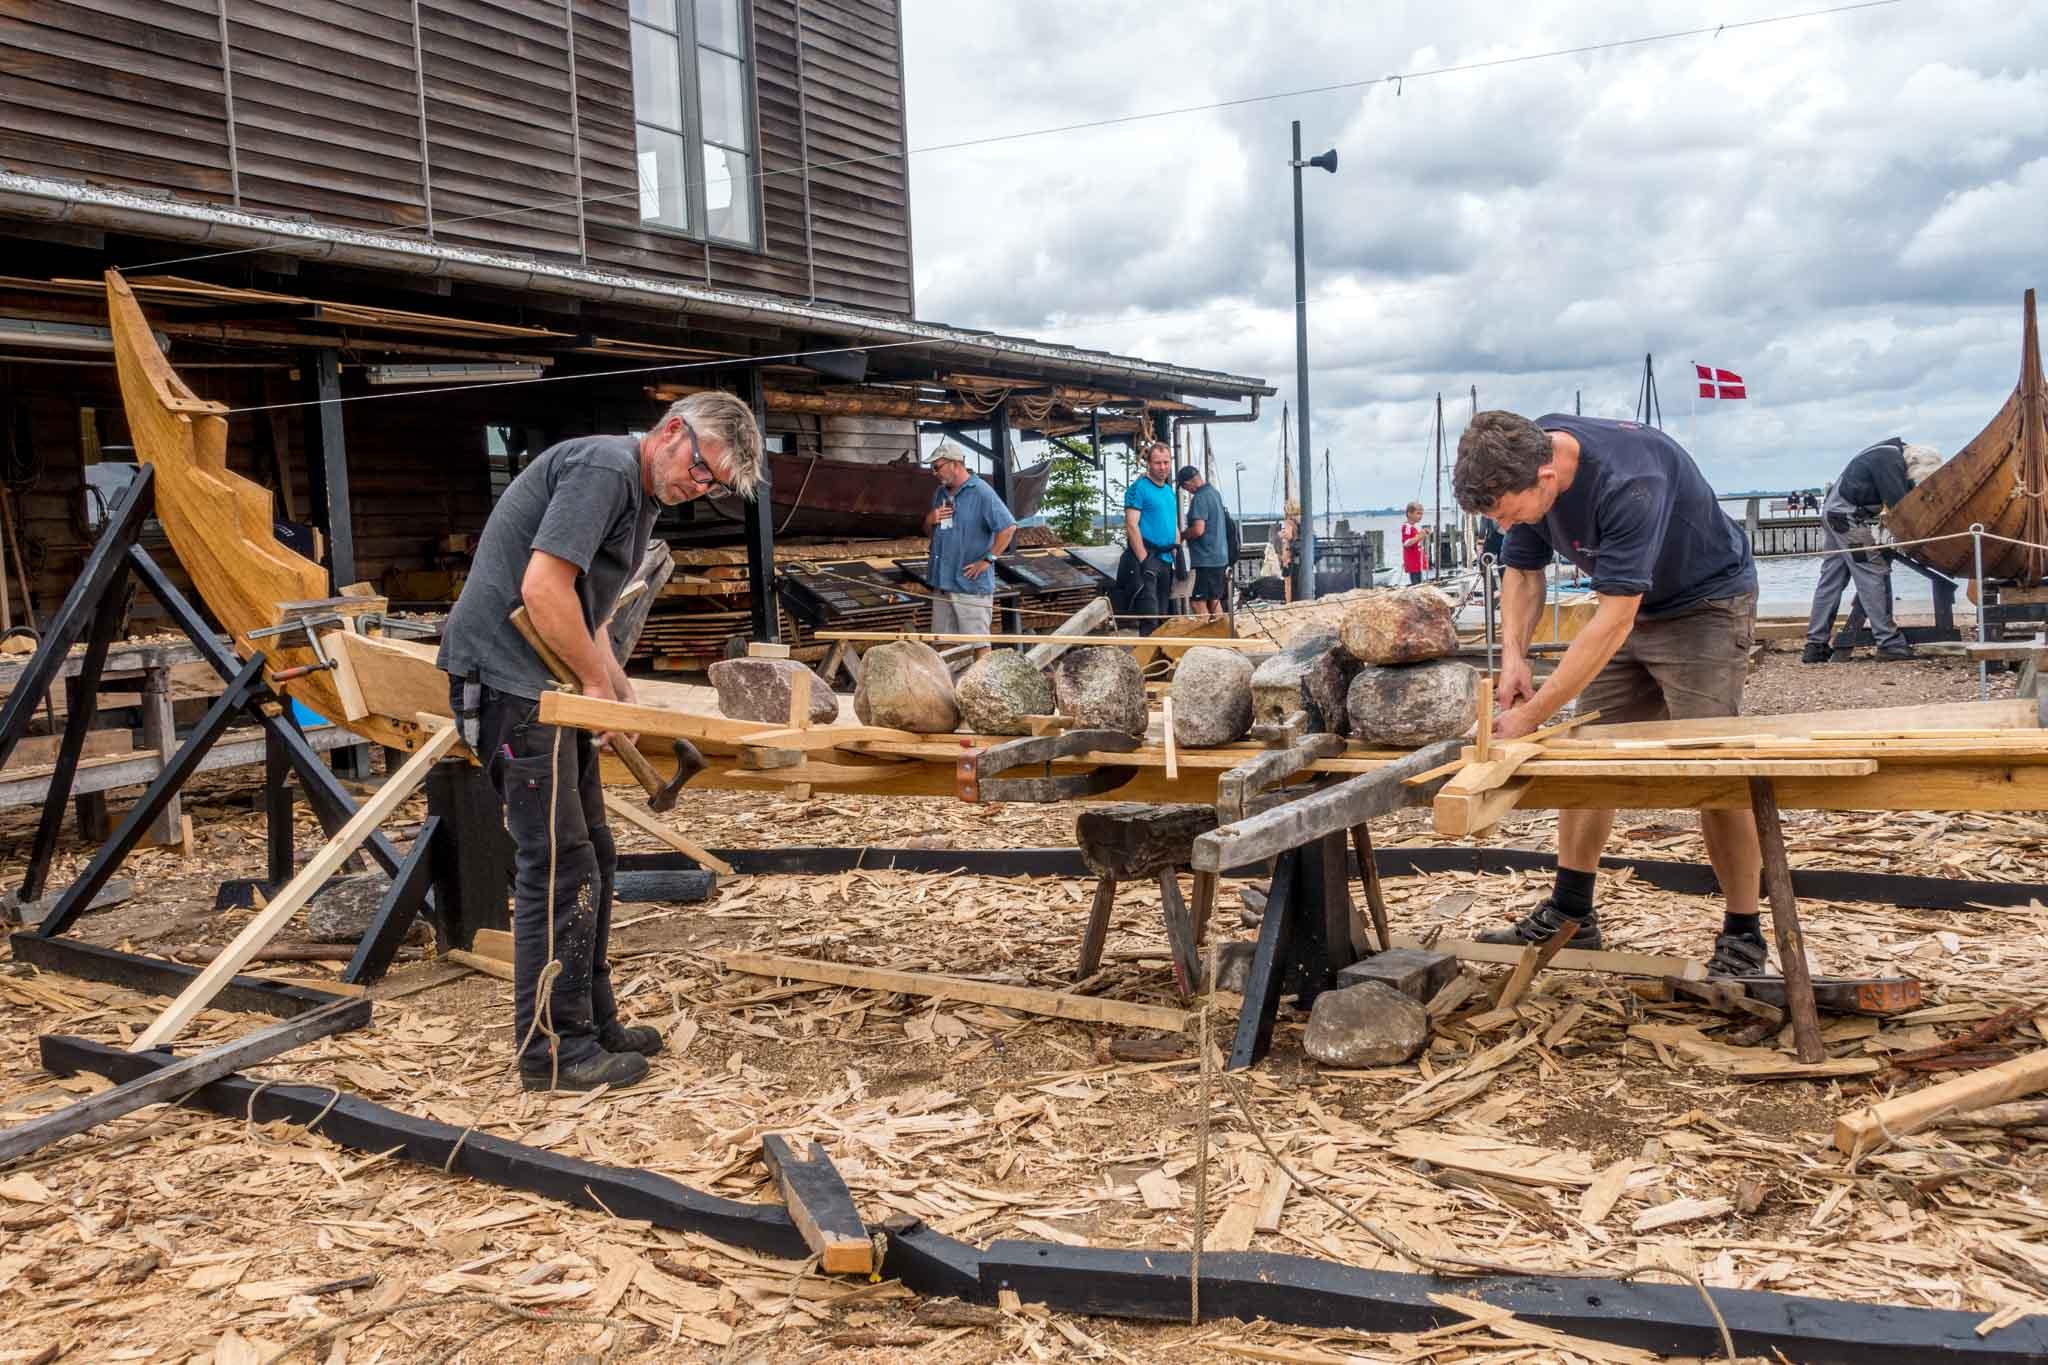 Expert builders building replica viking ships at the Viking Ship Museum in Roskilde Denmark